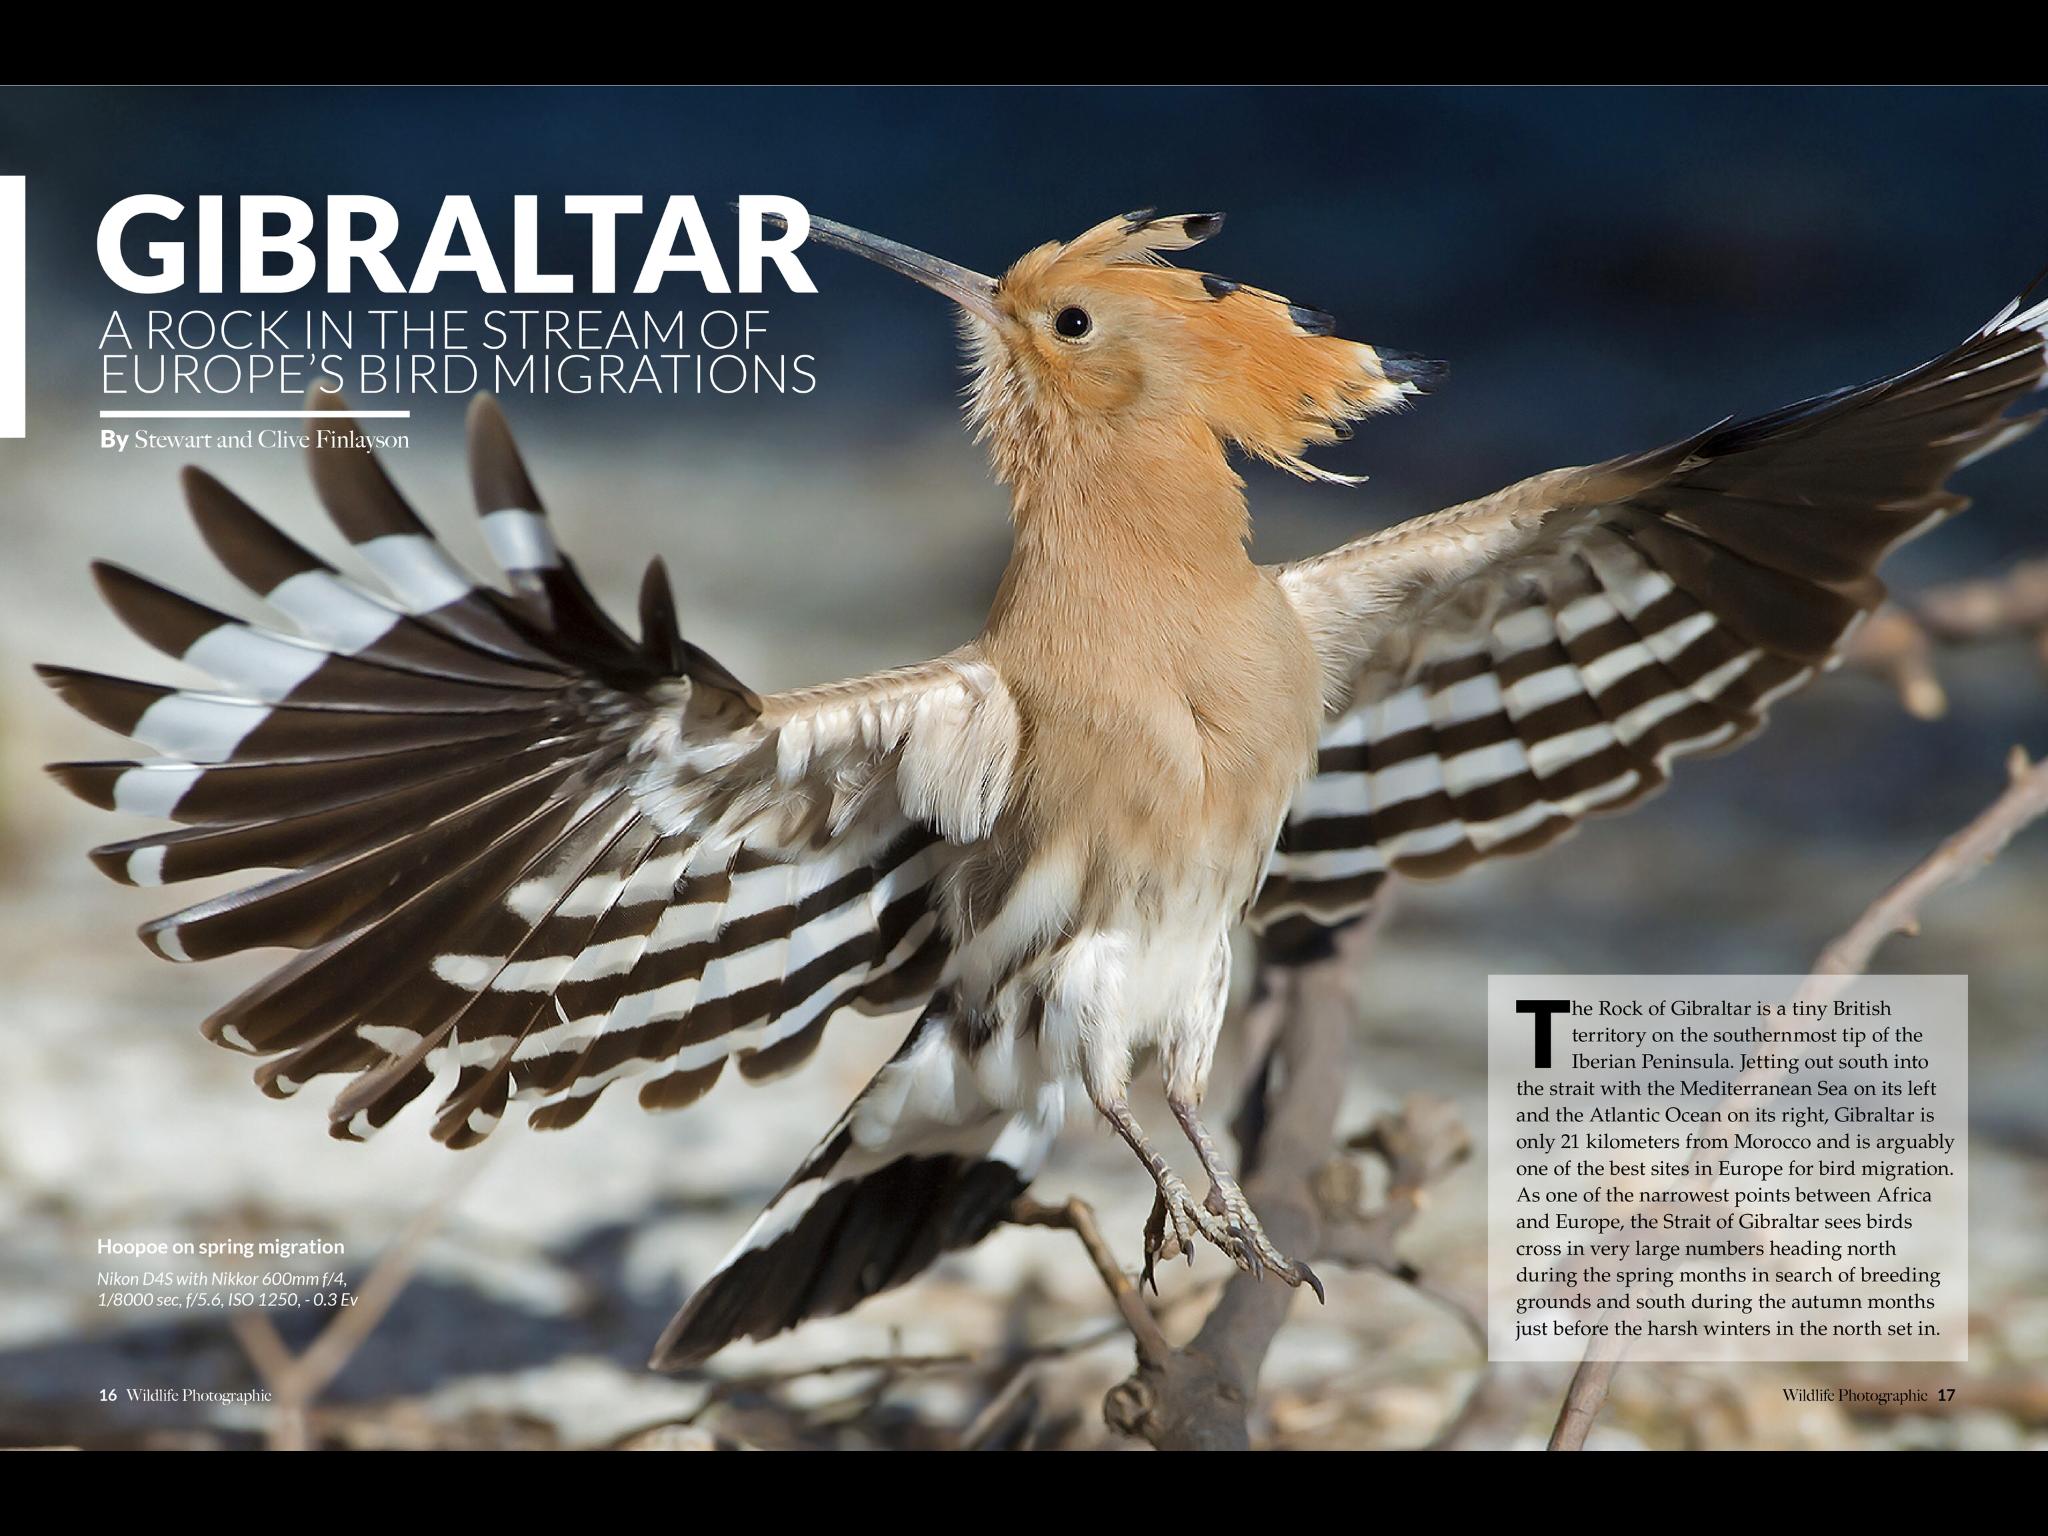 Gibraltar Wildlife Photographic Image